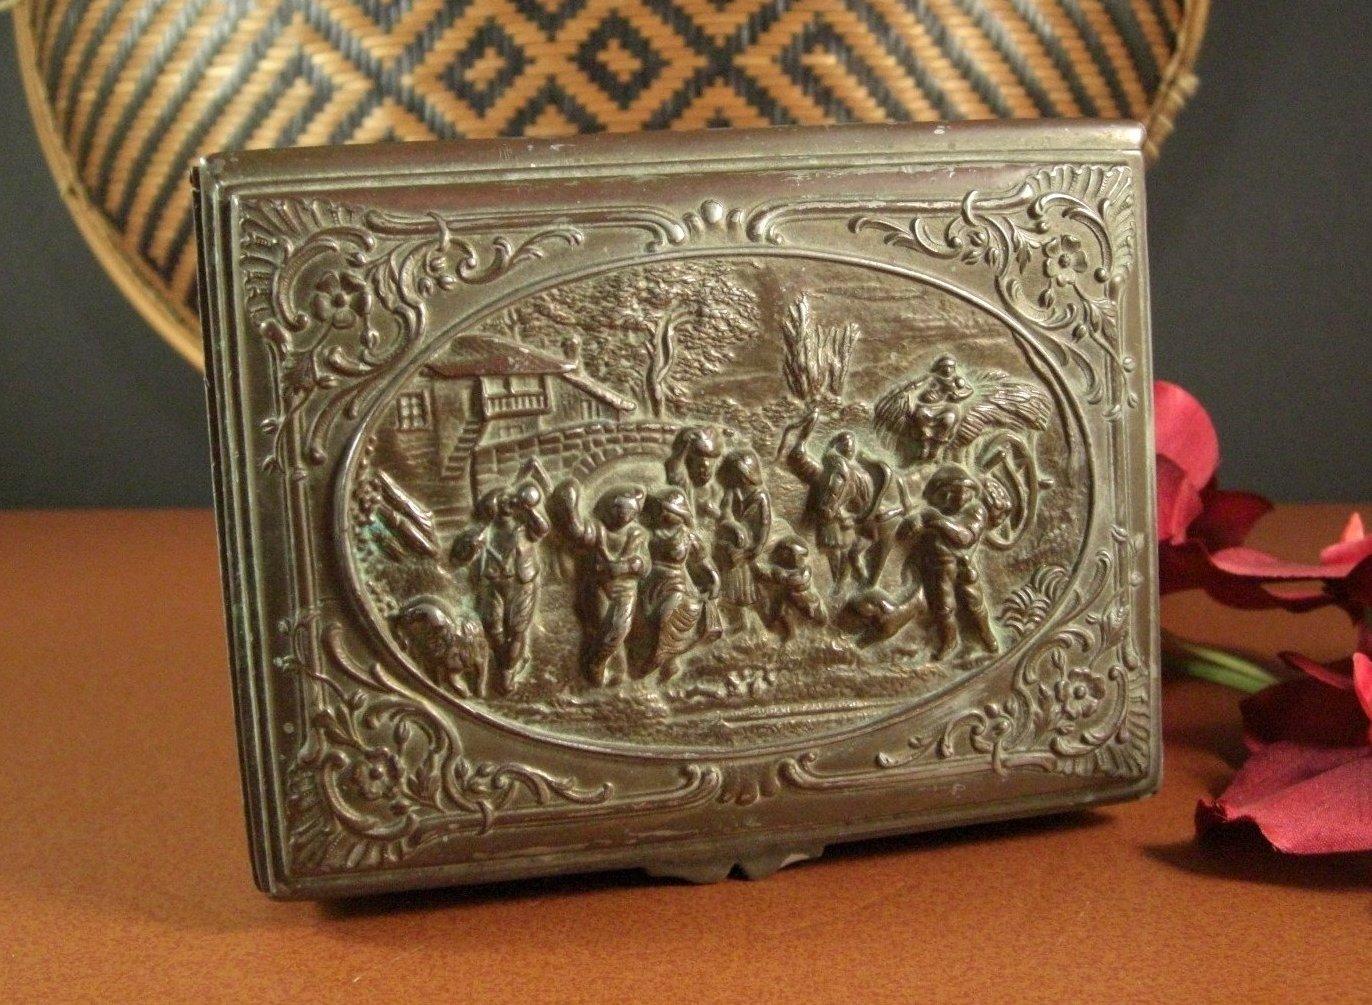 JB Jennings Brothers Desk Jewelry Trinket Box Bakelite Lining